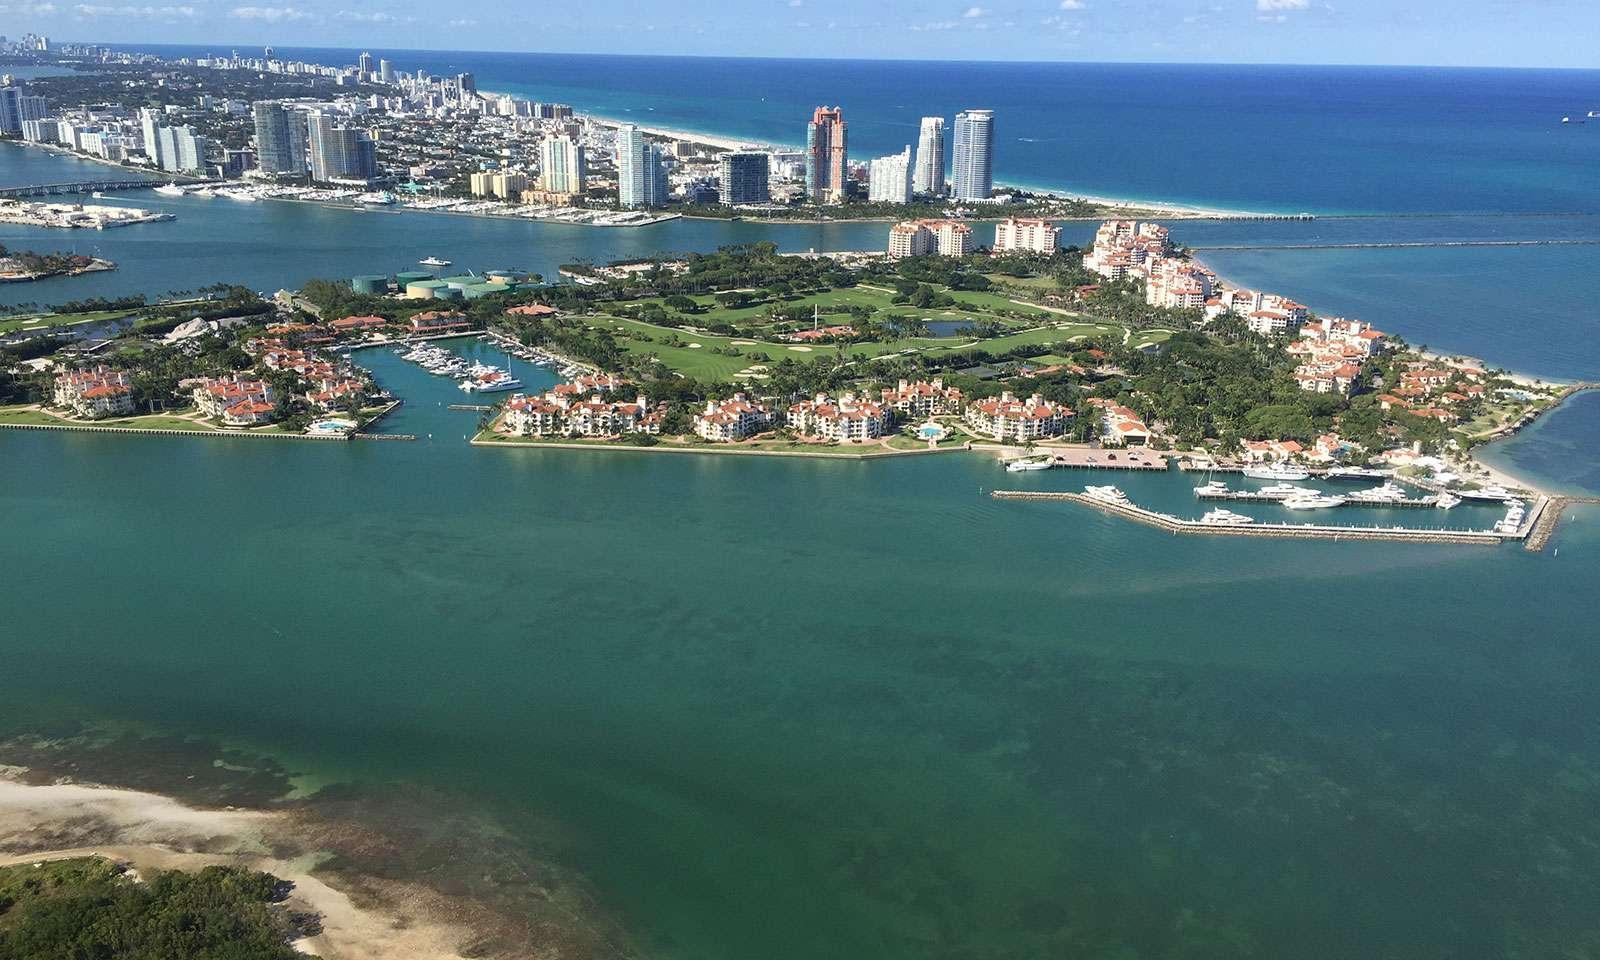 miami seaplane tours: Miami desde el aire